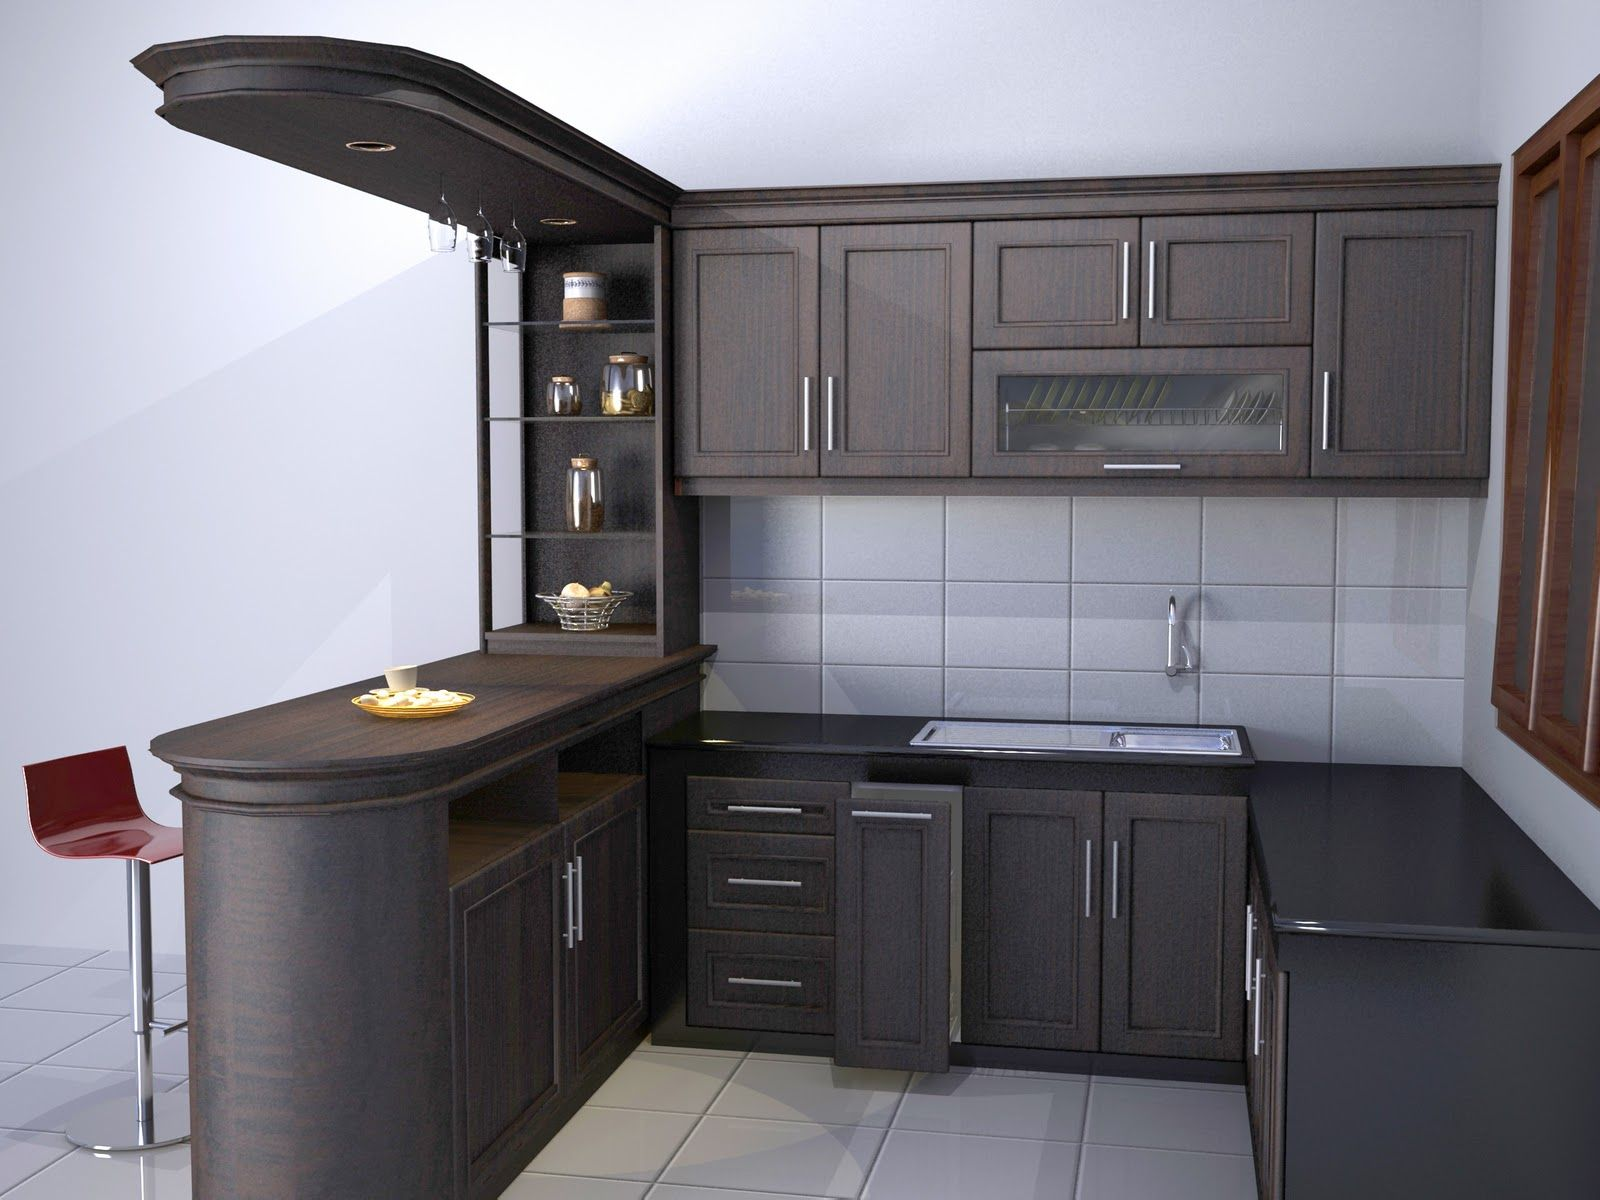 Harga Kitchen Set Per Meter Karya Tukang Jasa Pembuatan Furniture